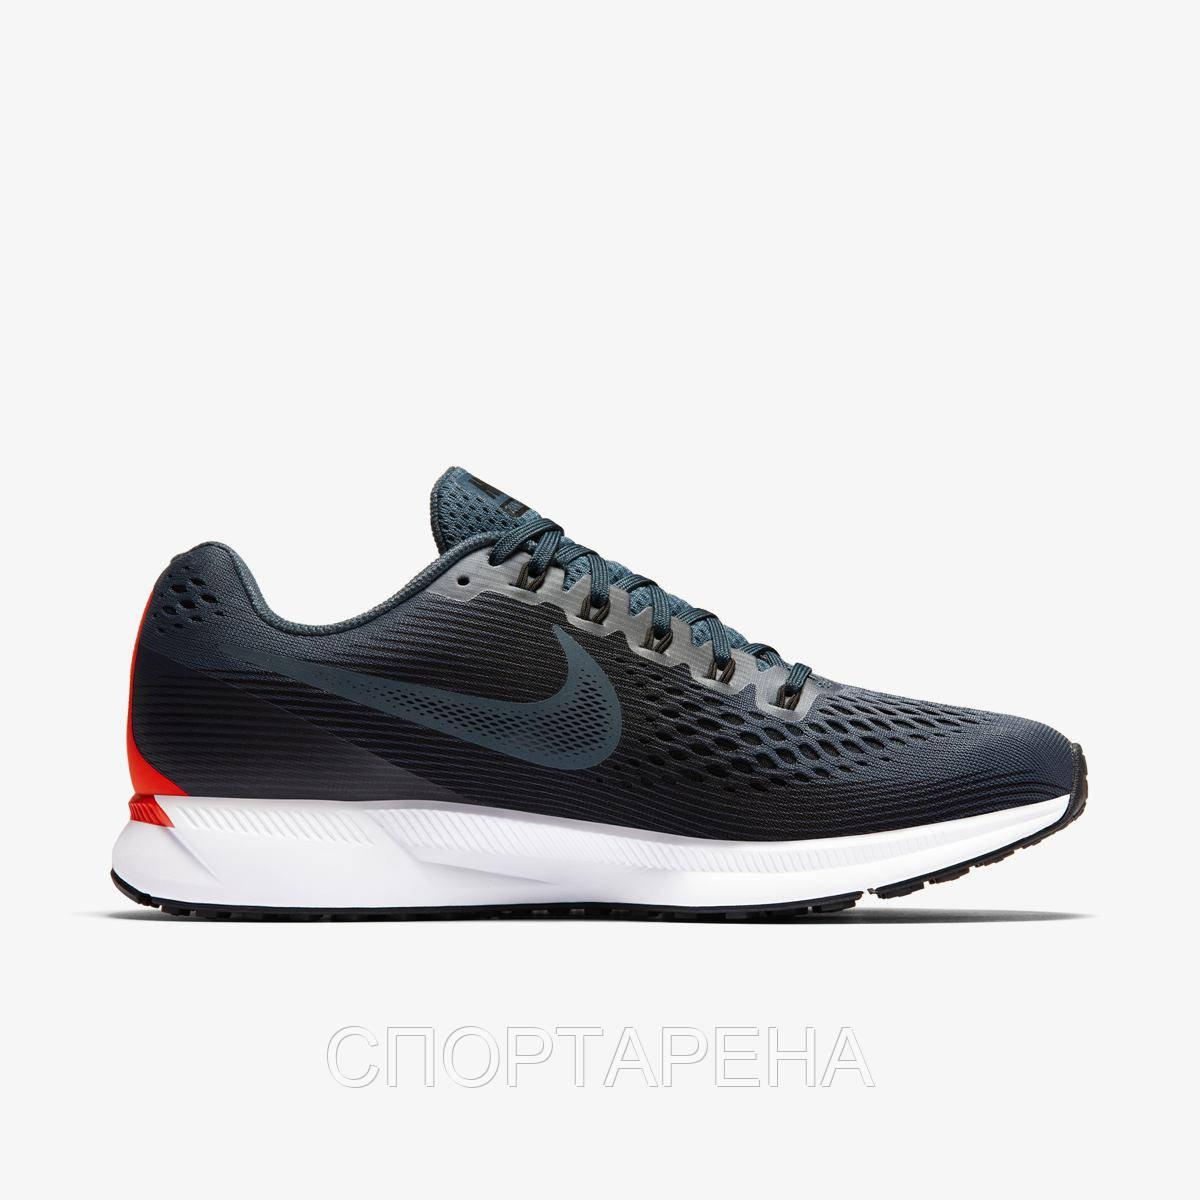 Кроссовки Nike AIR ZOOM PEGASUS 34 880555-403 - СПОРТАРЕНА в Днепре 37b989865c4